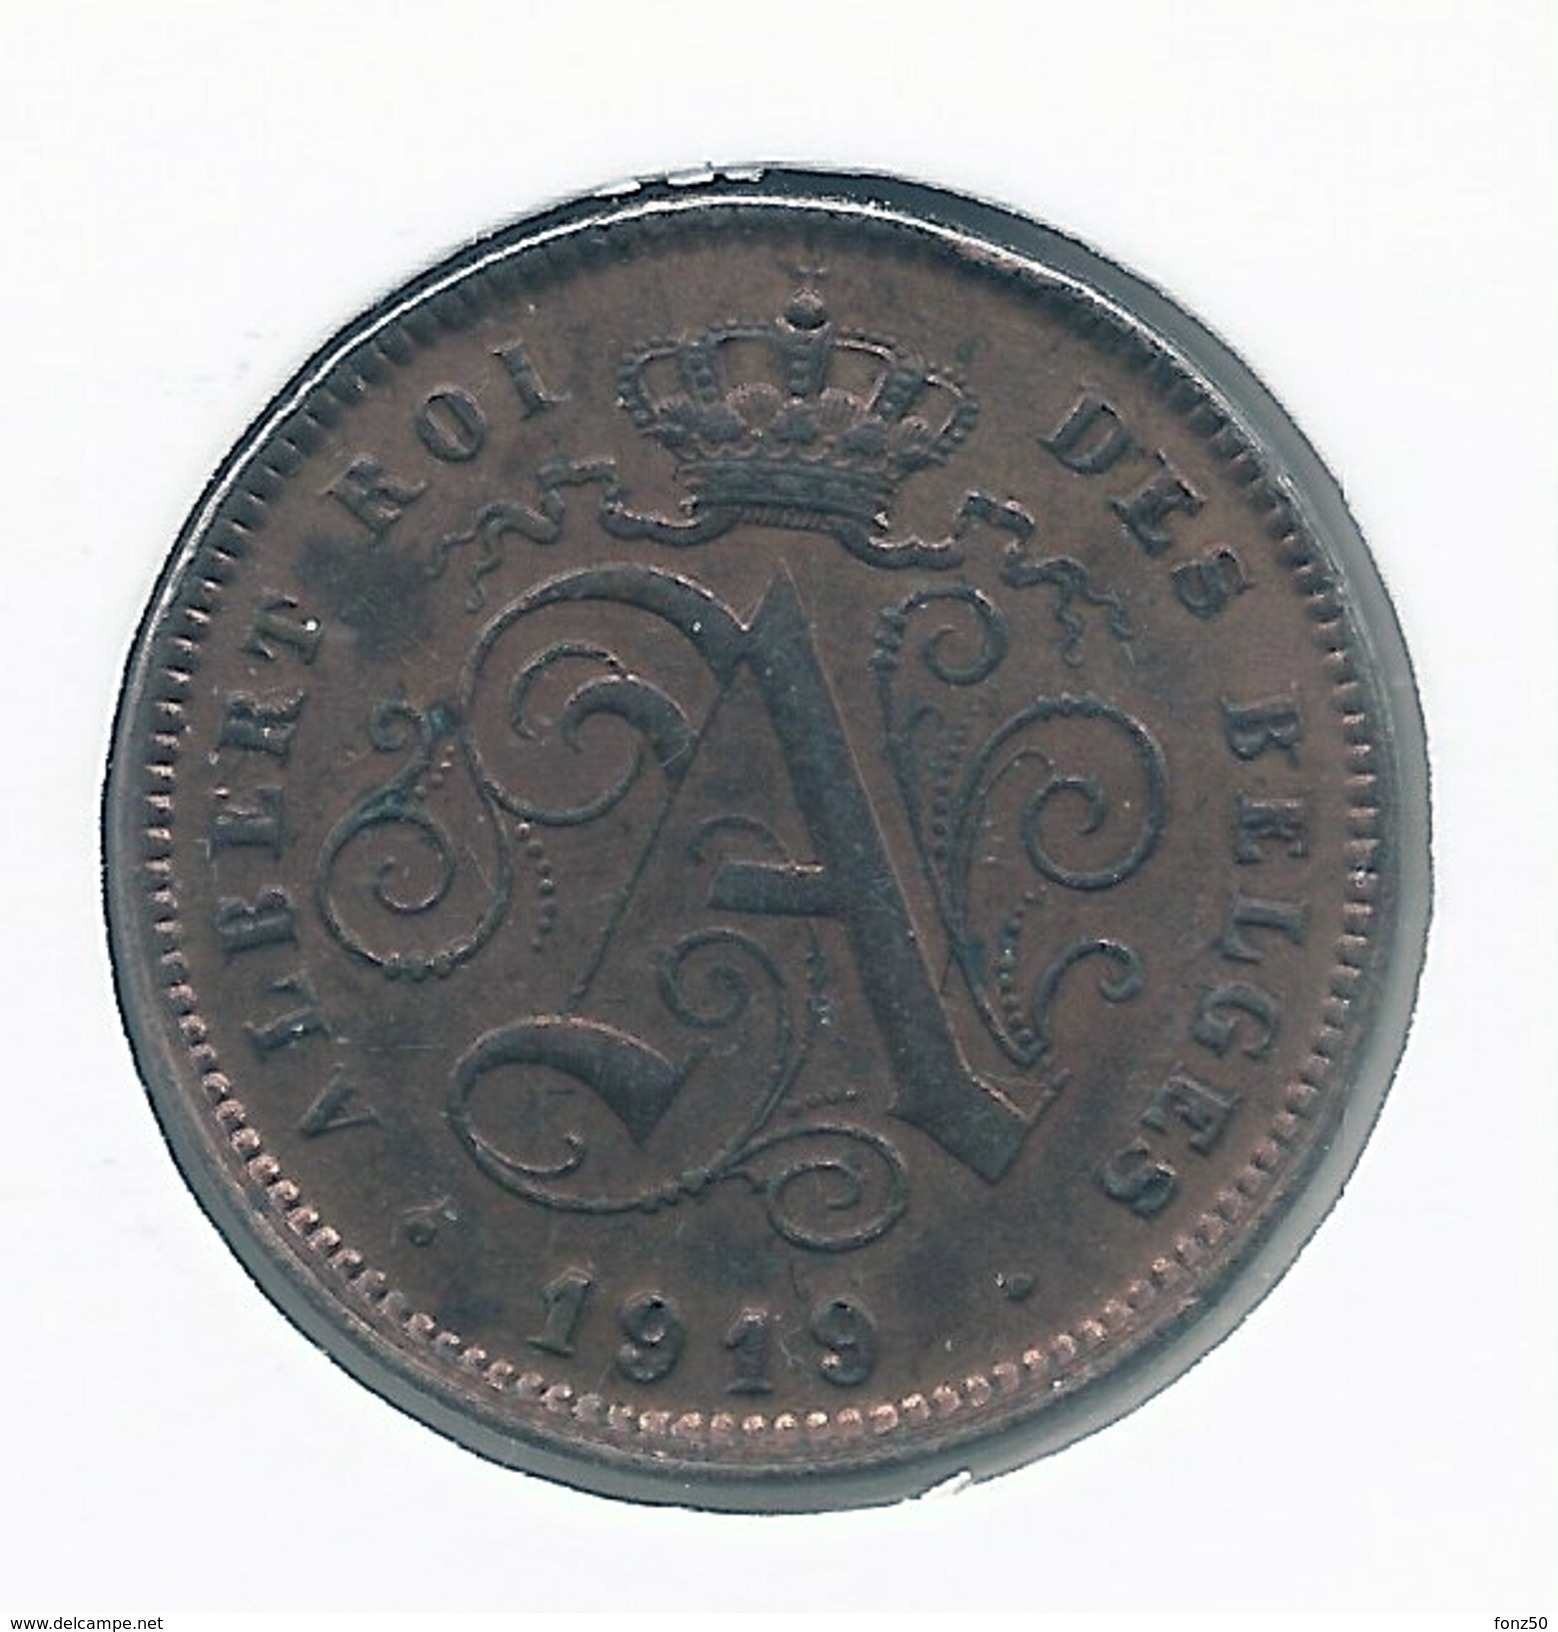 2 Cent 1919 Frans * Prachtig * Nr 3110 - 02. 2 Centimes